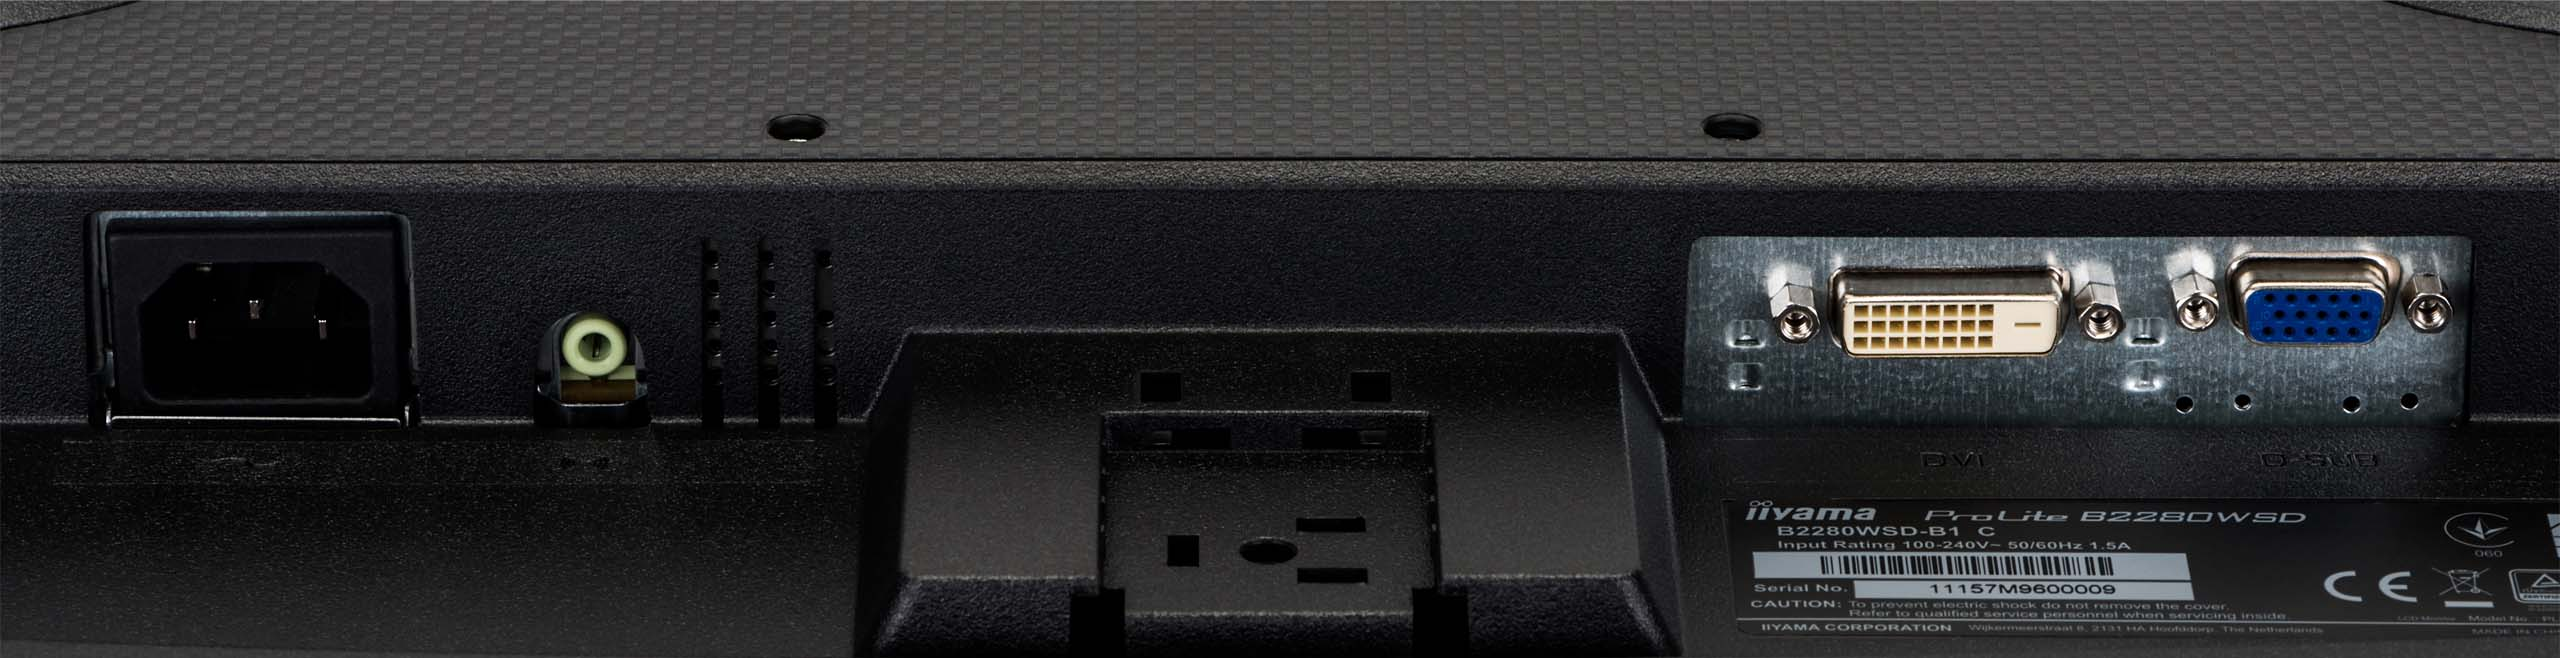 Écran PC bureautique Prolite B2280WSD-B1 Iiyama